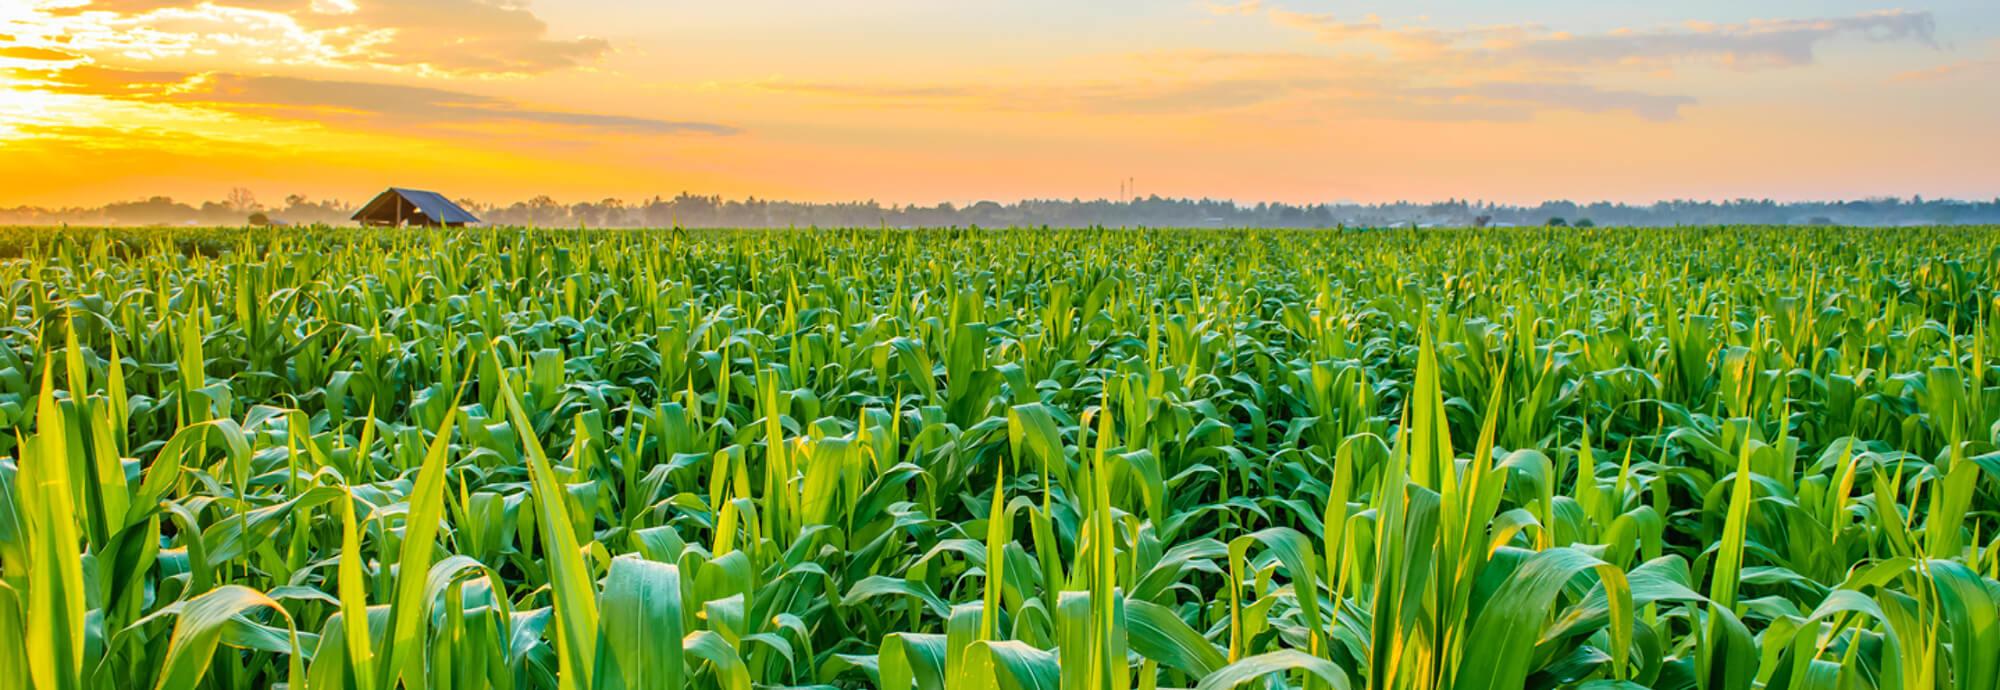 kukoricas-bannerhez